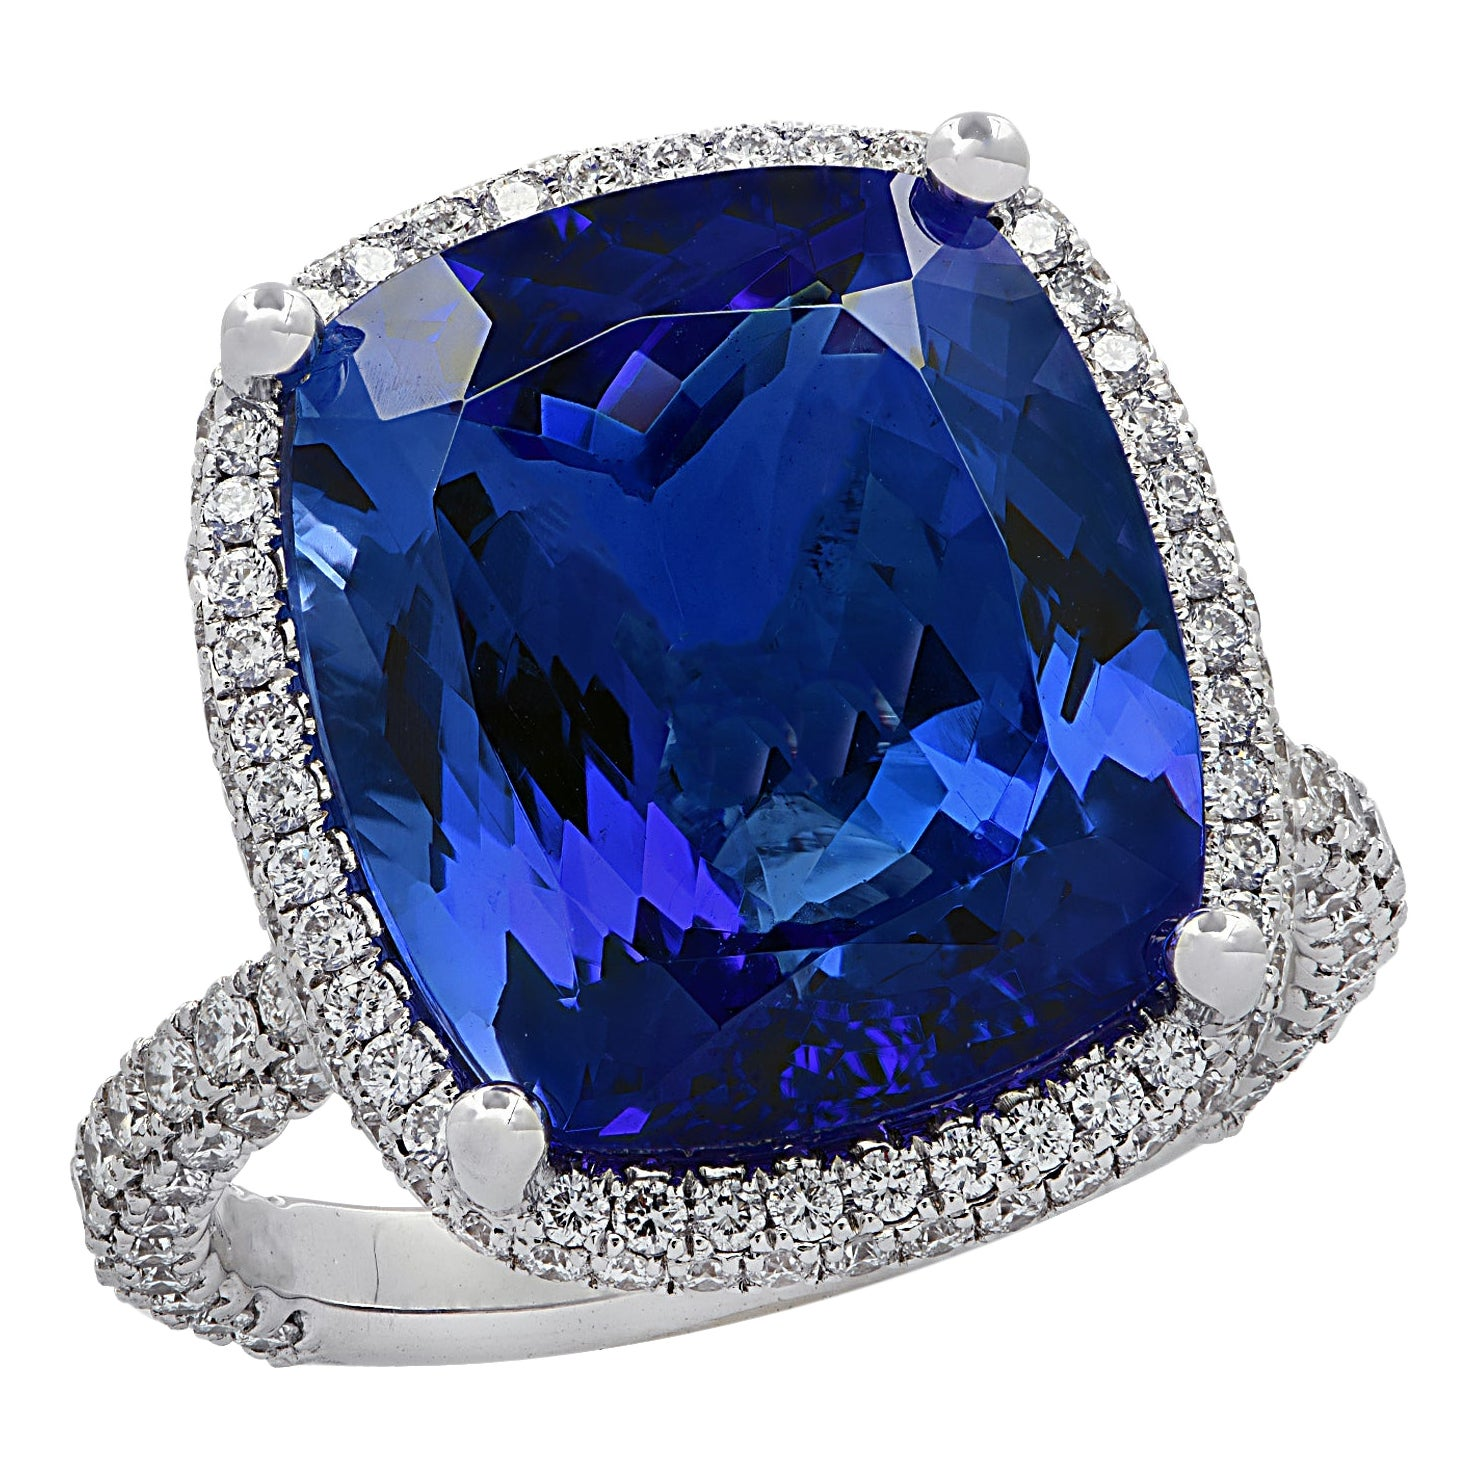 Vivid Diamonds 10.66 Carat Tanzanite Ring